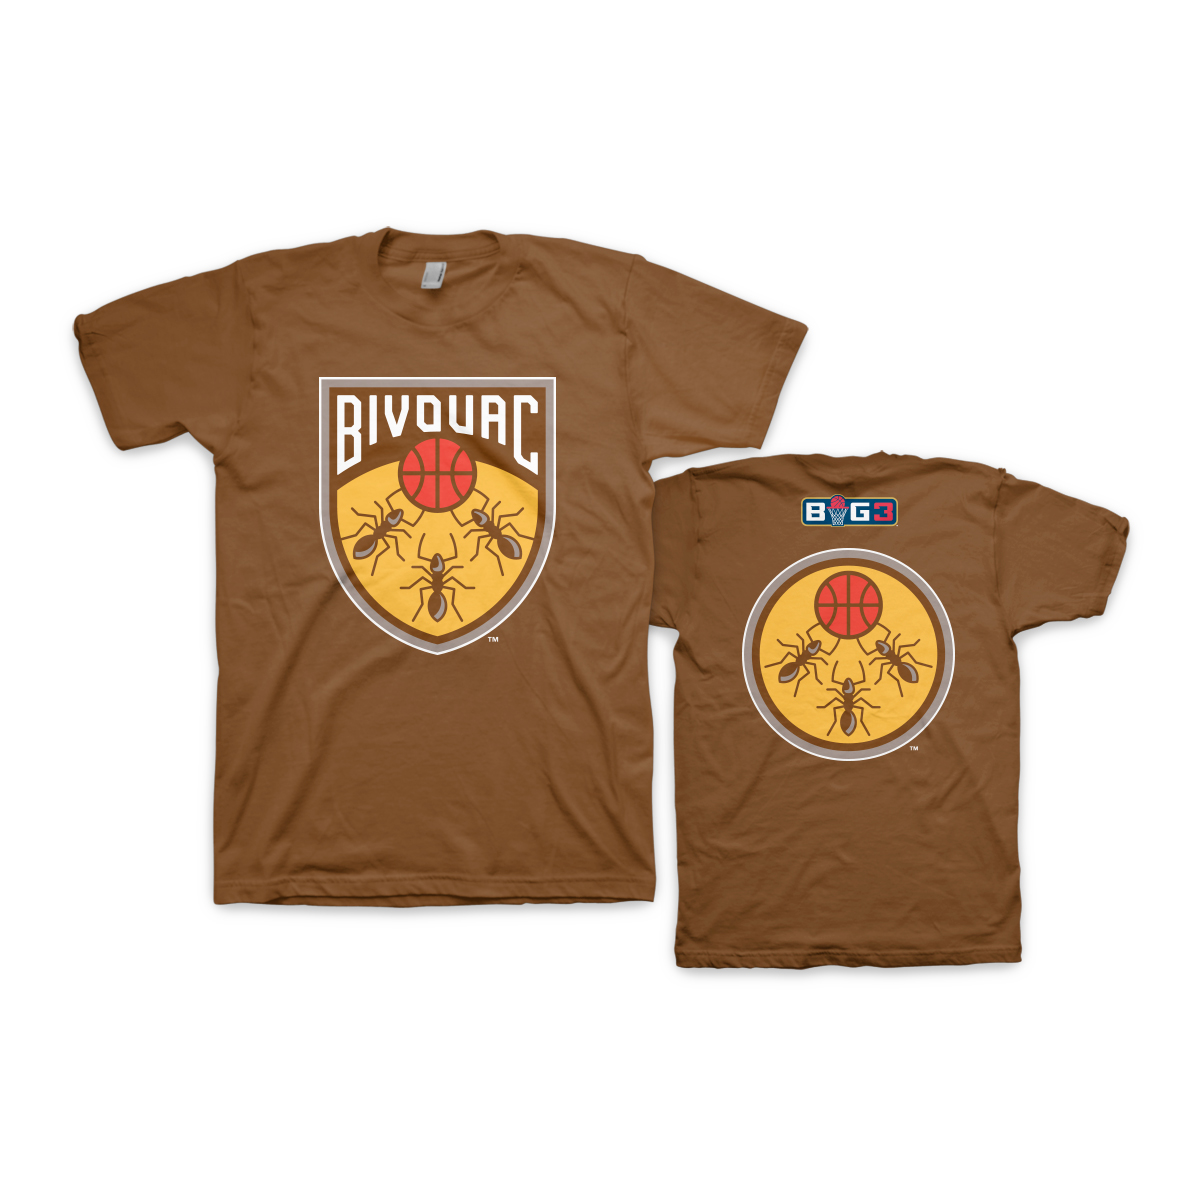 Bivouac - Webstore Exclusive 2019 Season T-Shirt